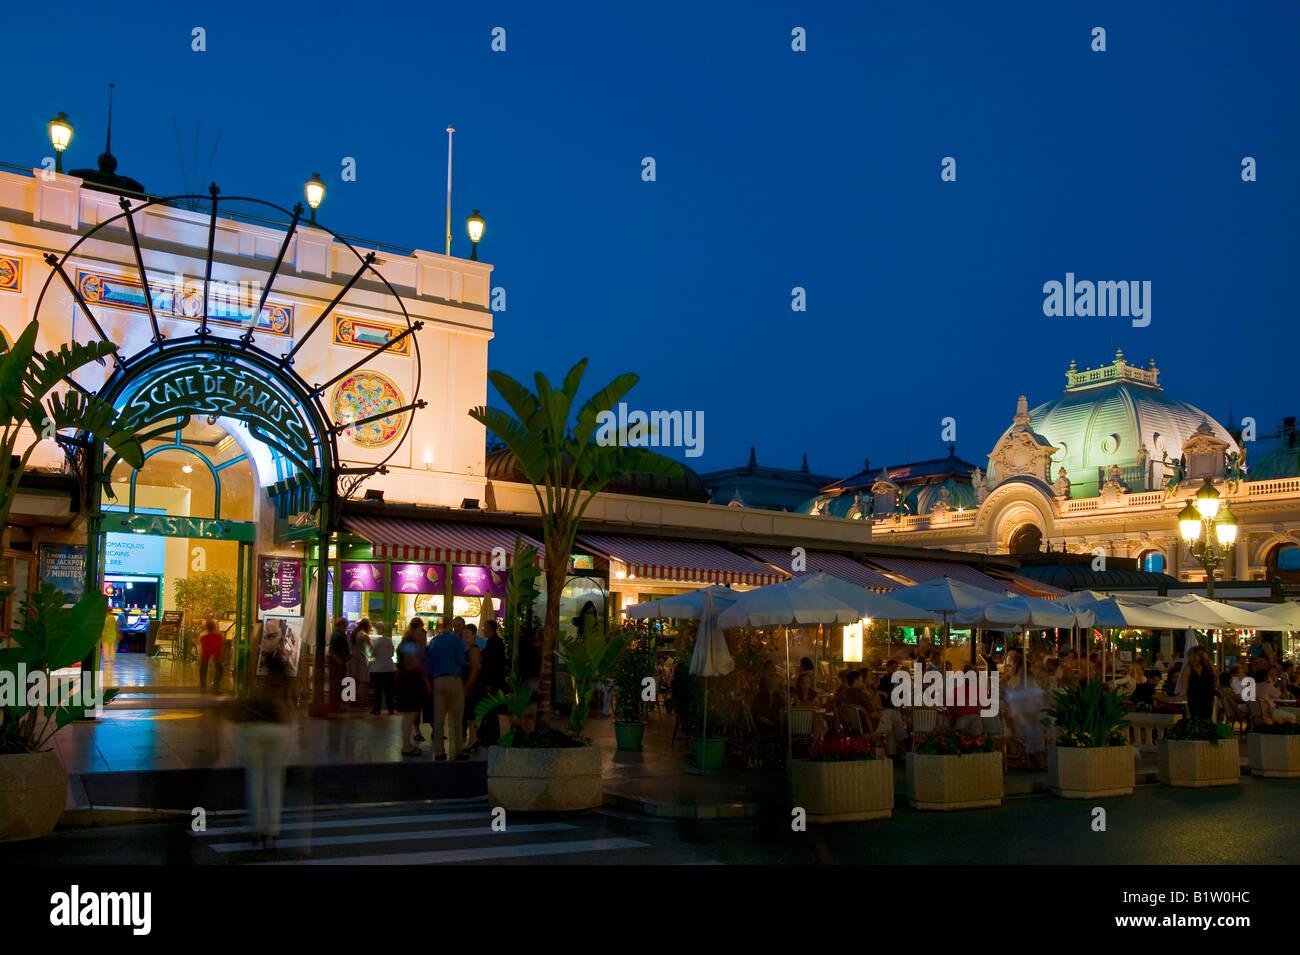 Leovegas casino nederlandse antillen 1govuc moh